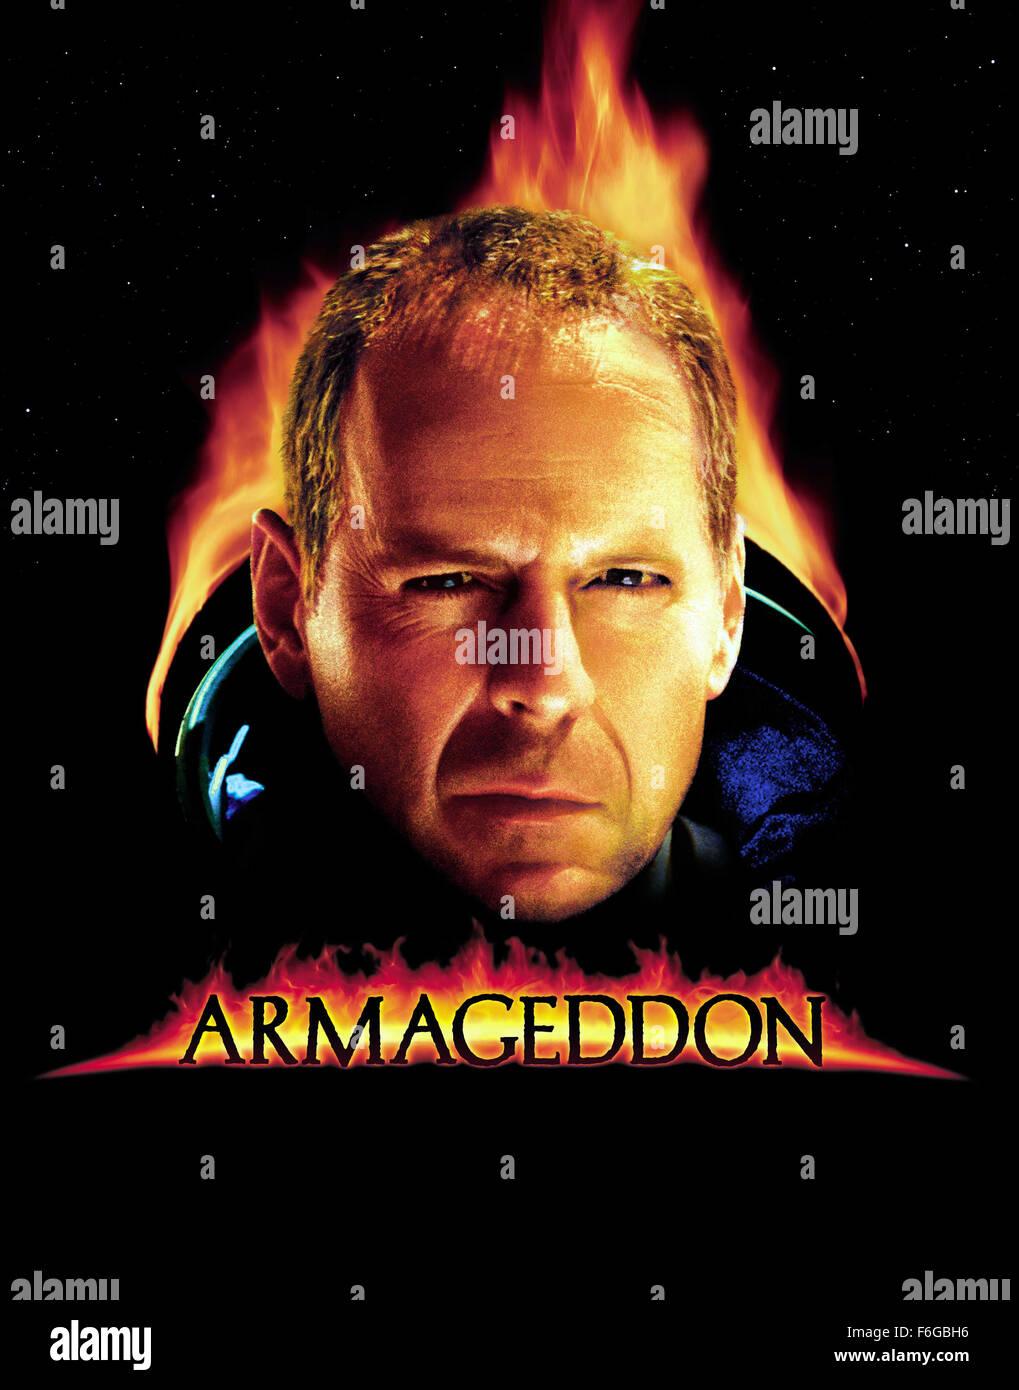 armageddon movie poster - 786×1000